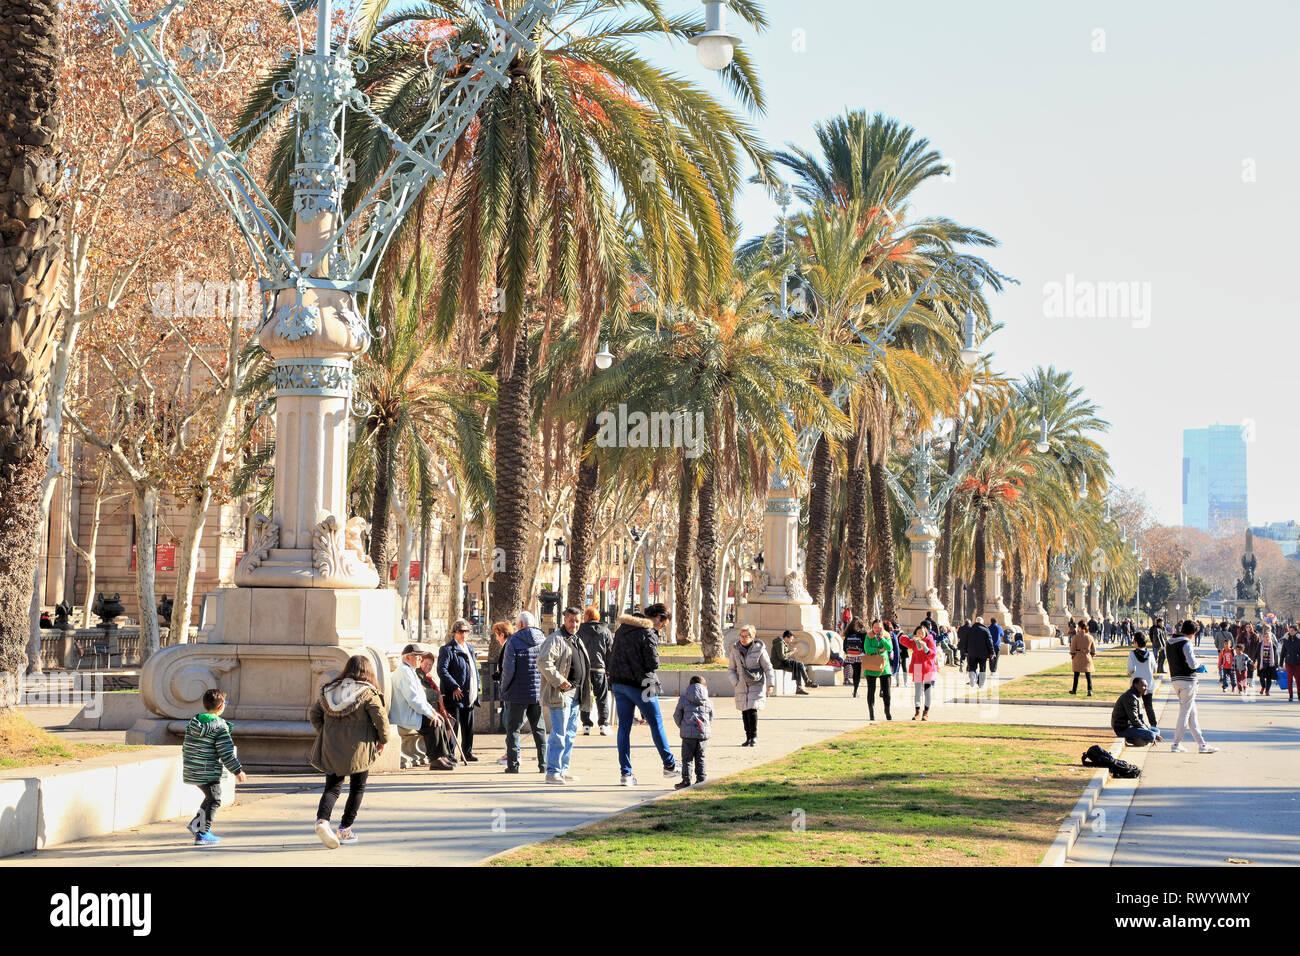 Parc de la Ciutadella, Passeig de Lluís Companys, Barcelona - Stock Image